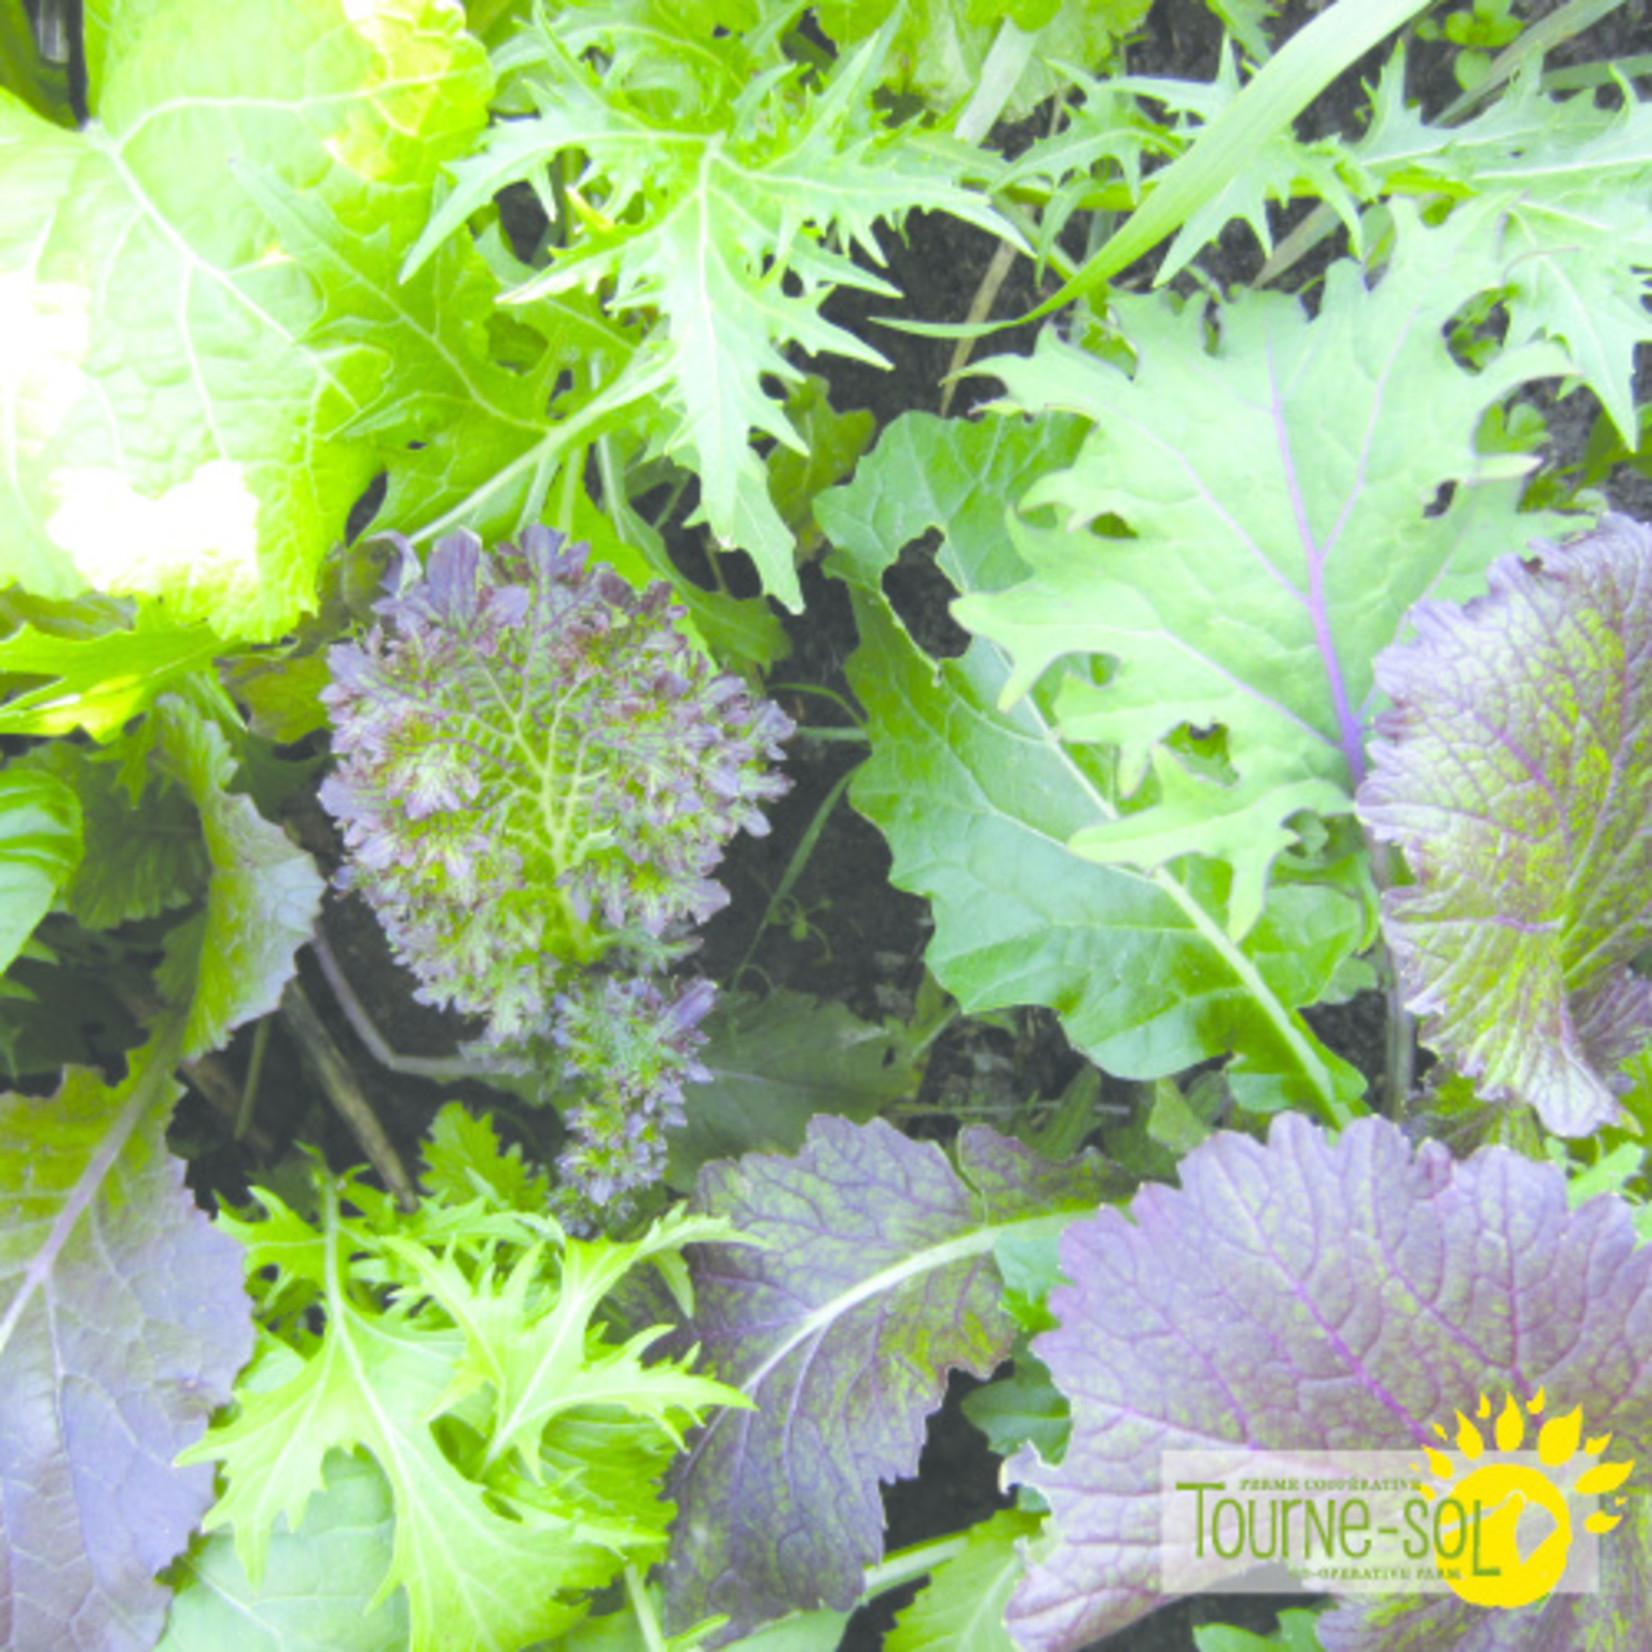 Tourne-Sol Deluxe brassica blend mesclun